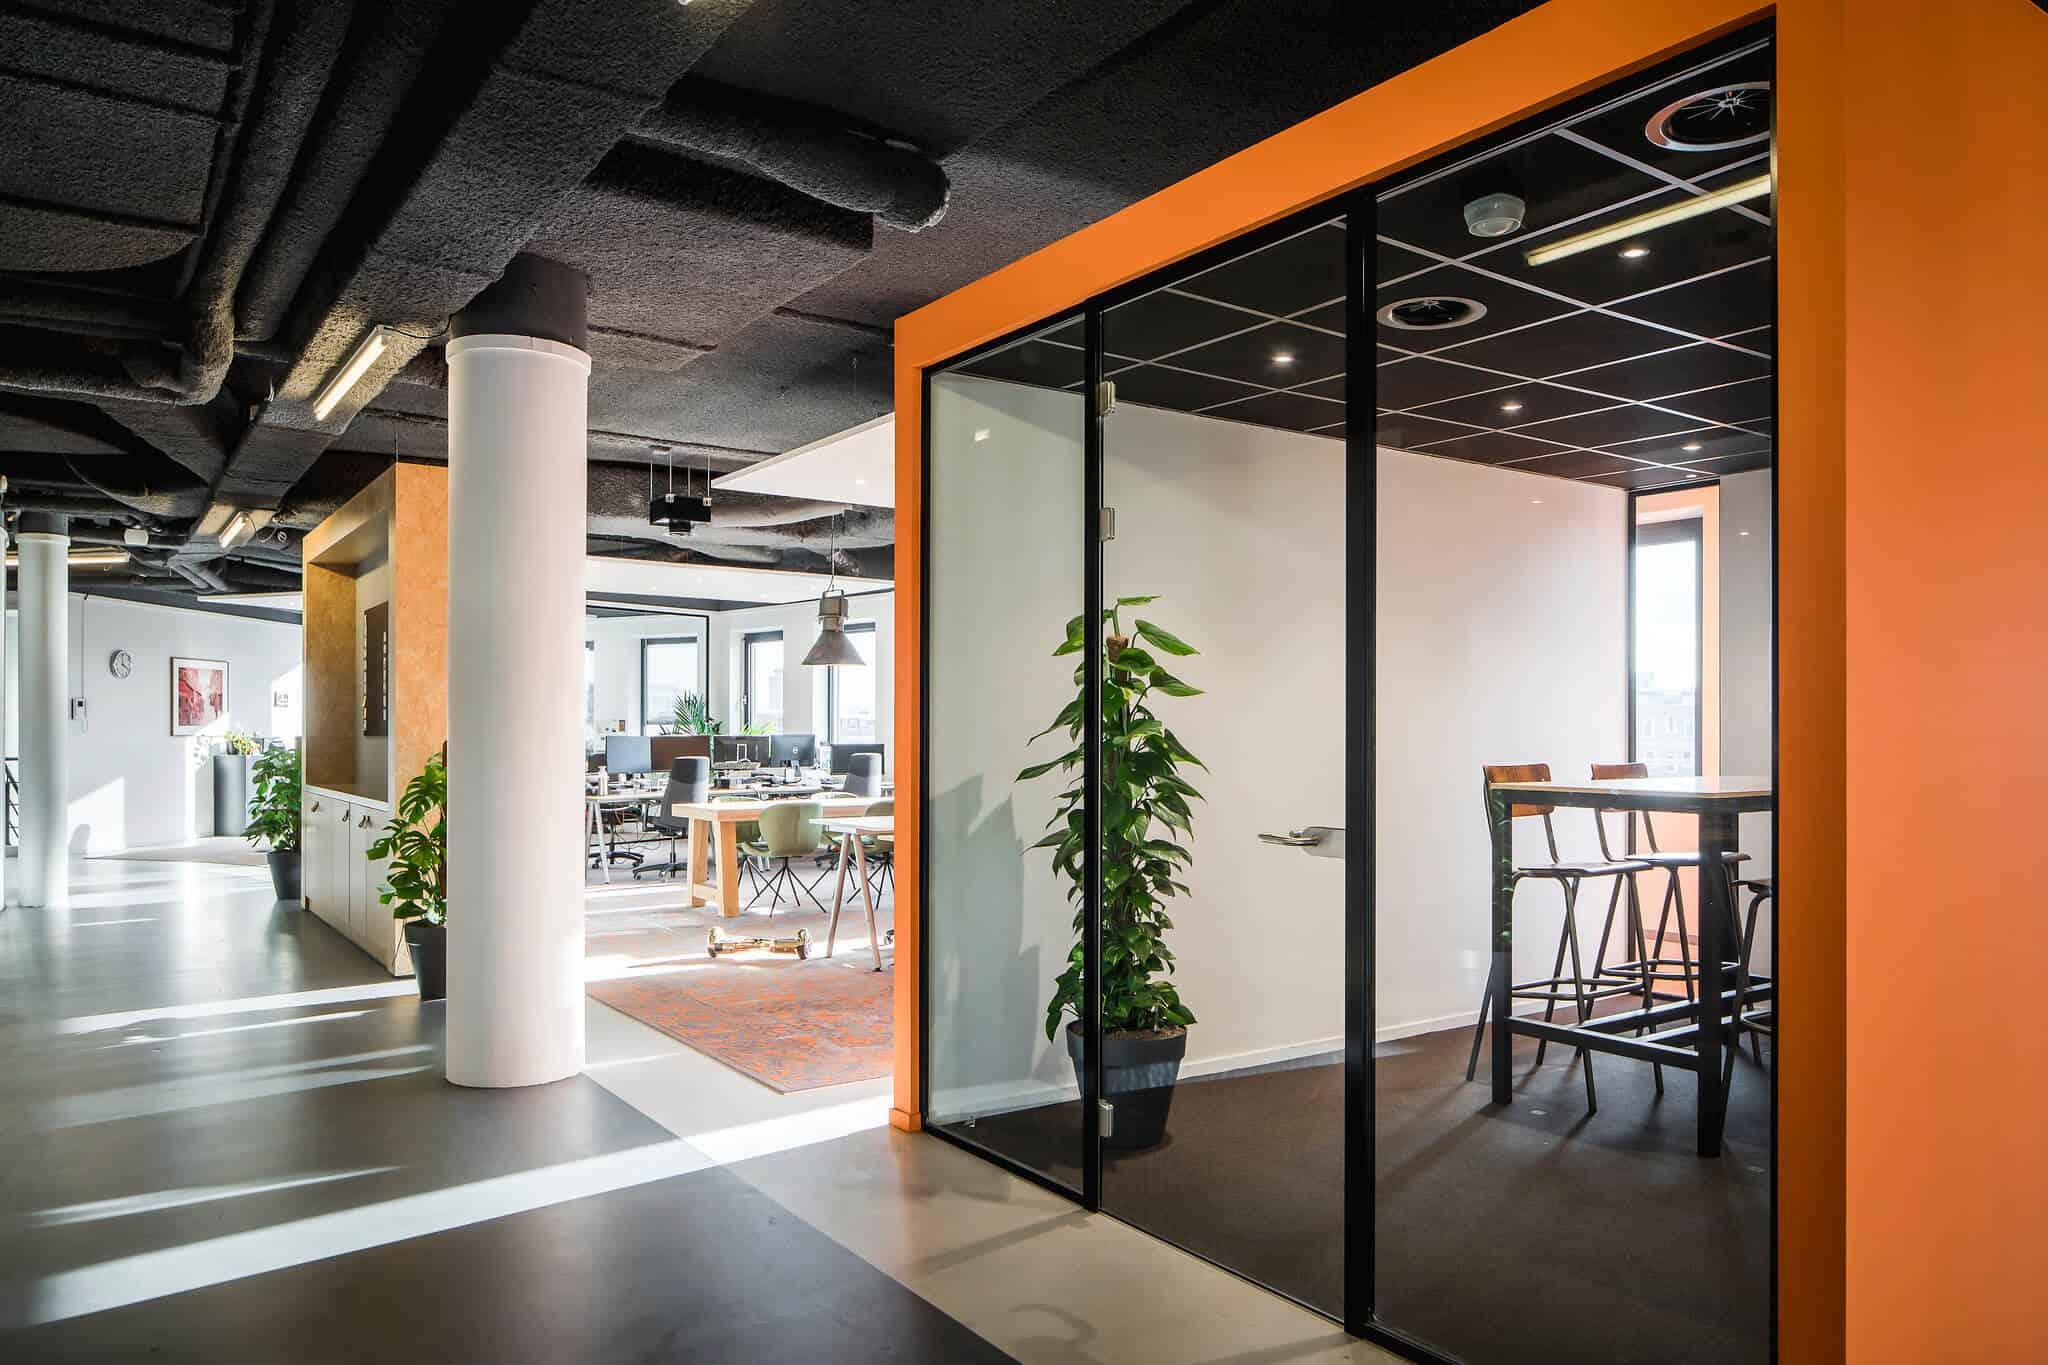 Interieurarchitect Wildenberg ontwerpt hoofdkantoor Infi overlegruimte